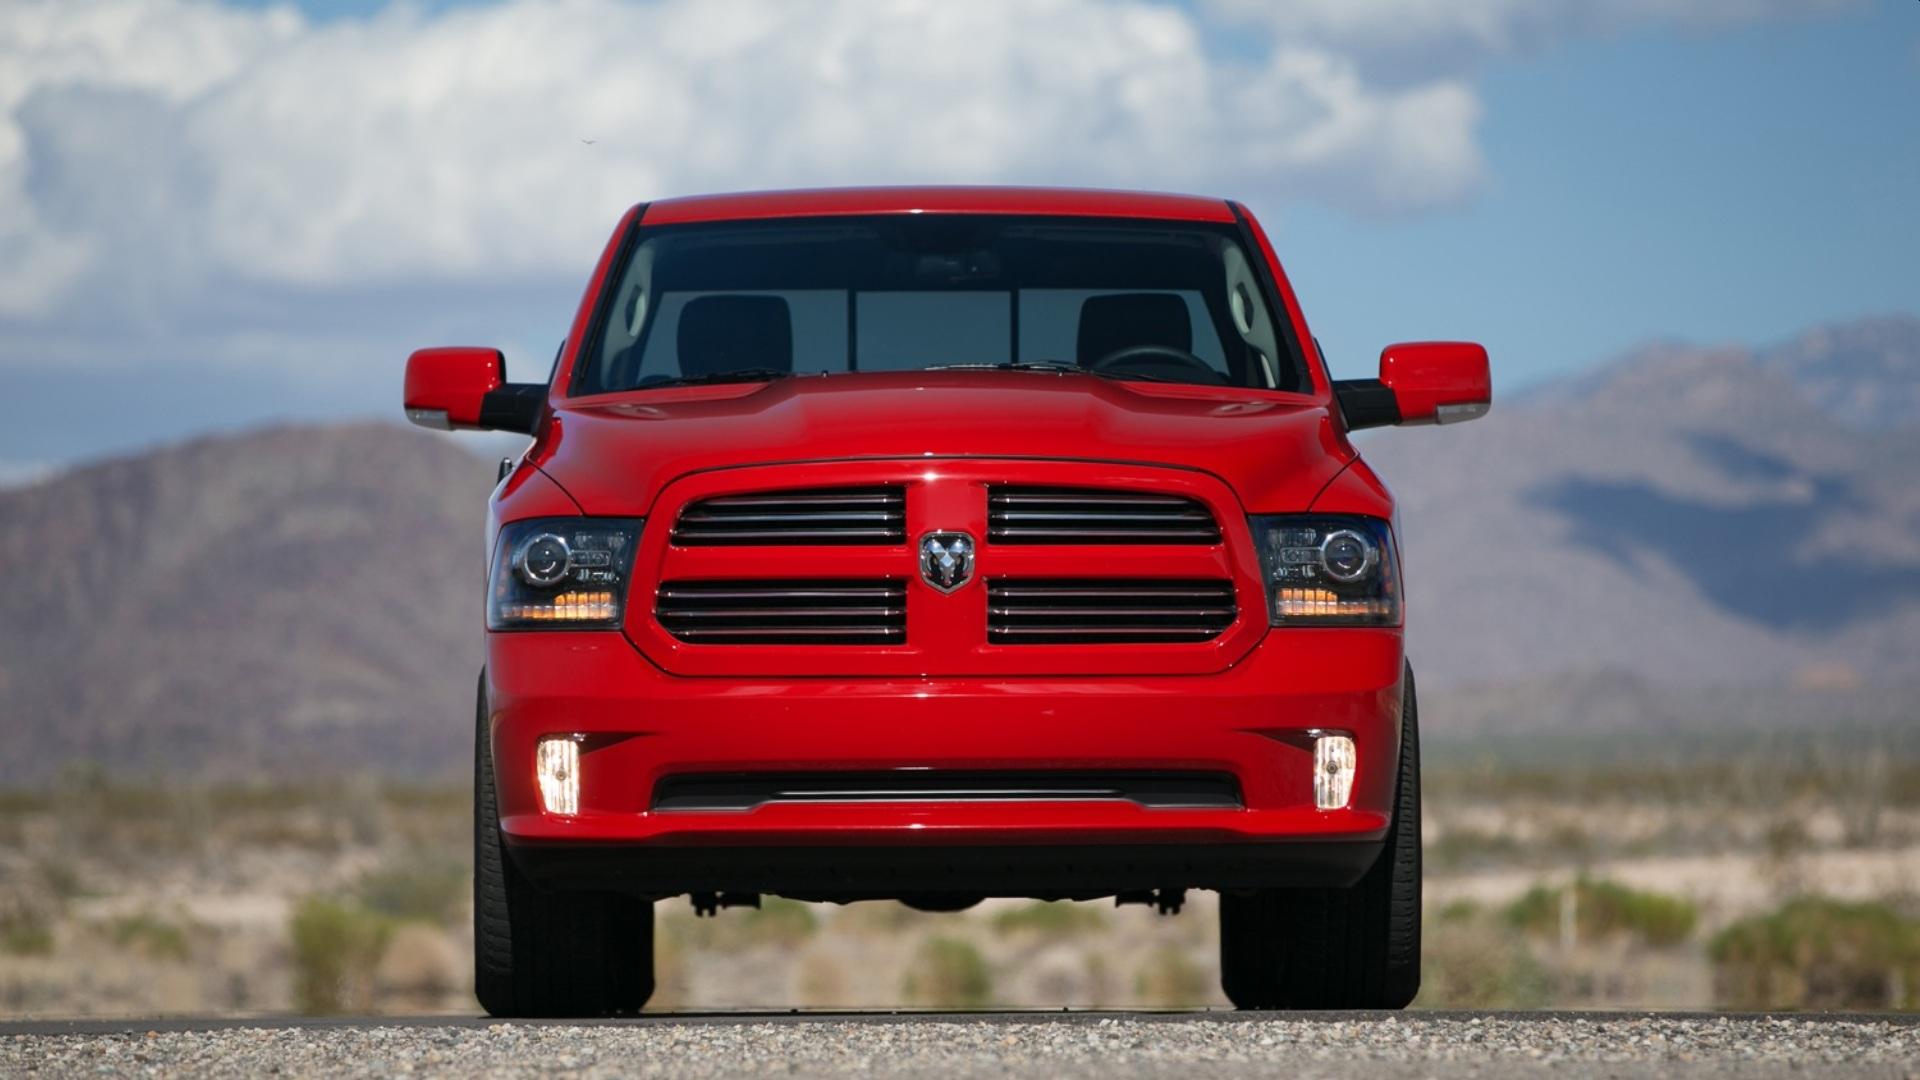 Dodge Ram Pickup 1500 Wallpaper Hd 1920x1080 Download Hd Wallpaper Wallpapertip